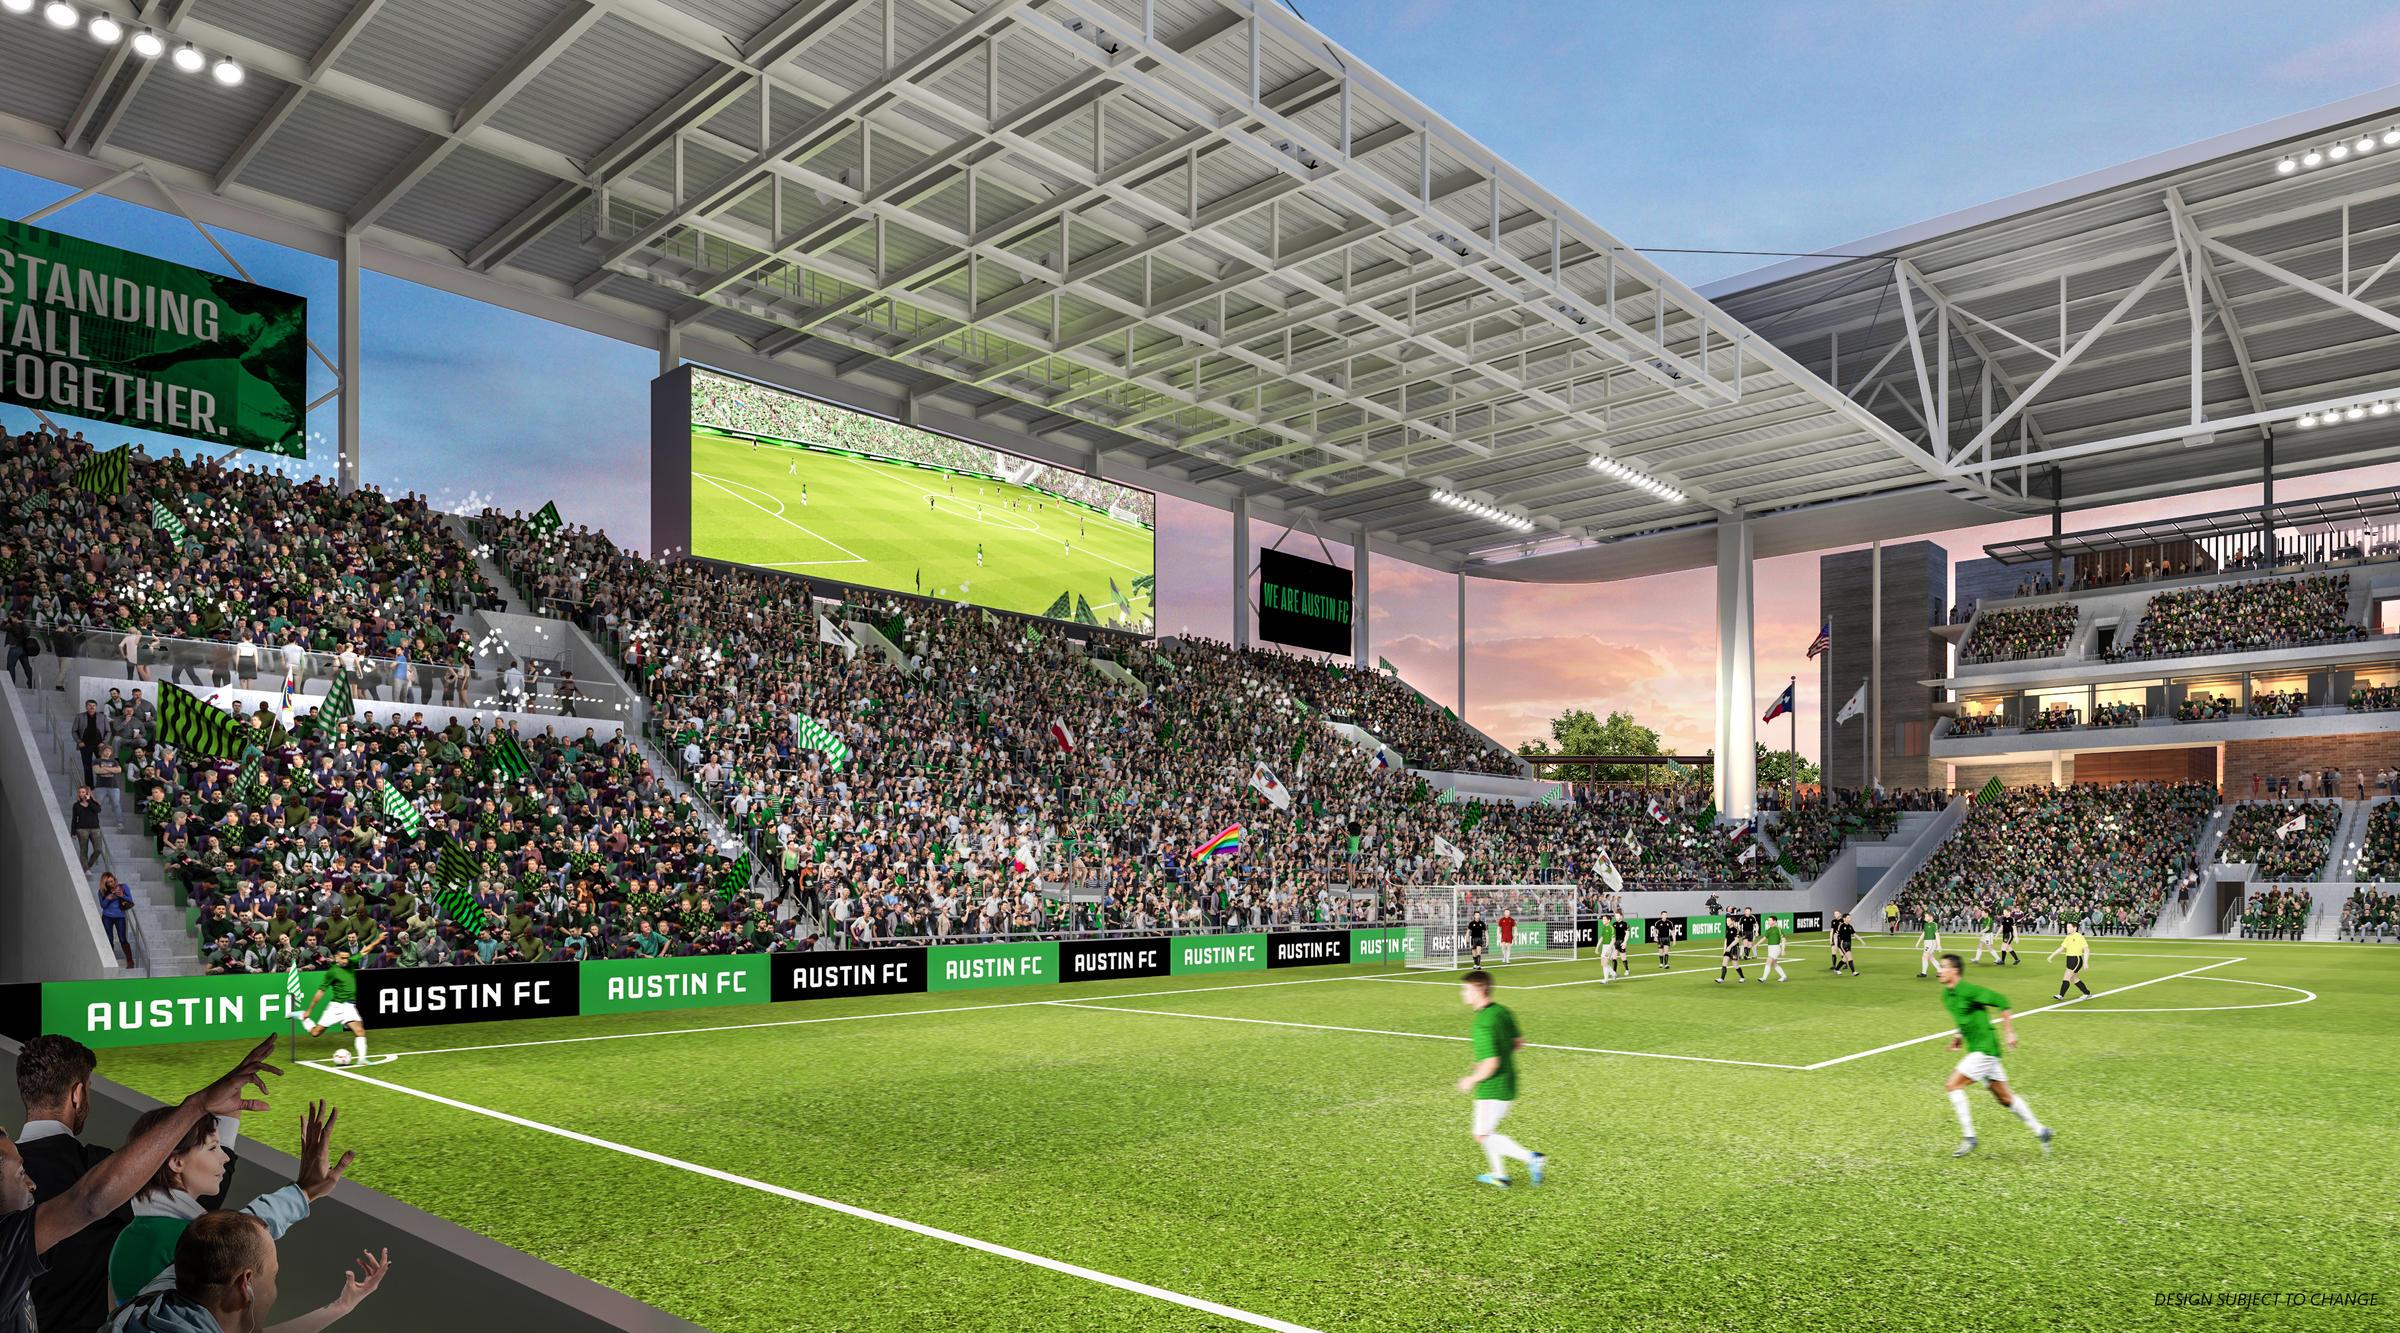 here s what austin s major league soccer stadium is going to look like kut major league soccer stadium